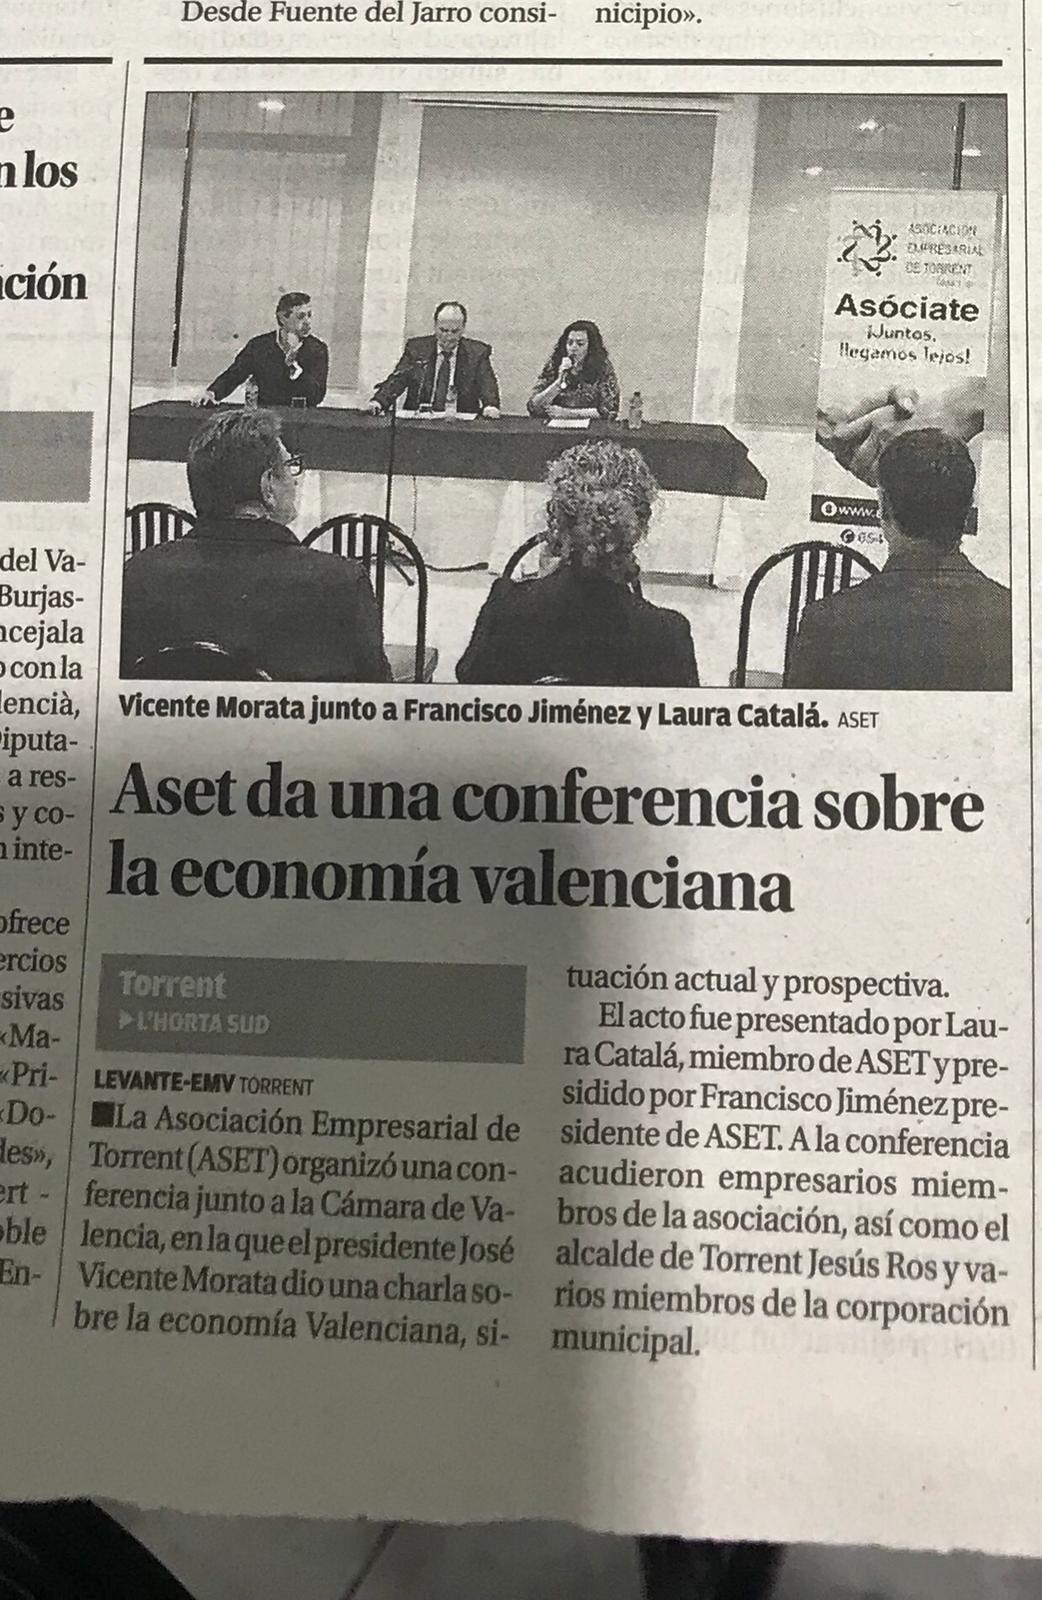 2018 01 25 PHOTO 00002669 - Conferencia Cámara de Valencia